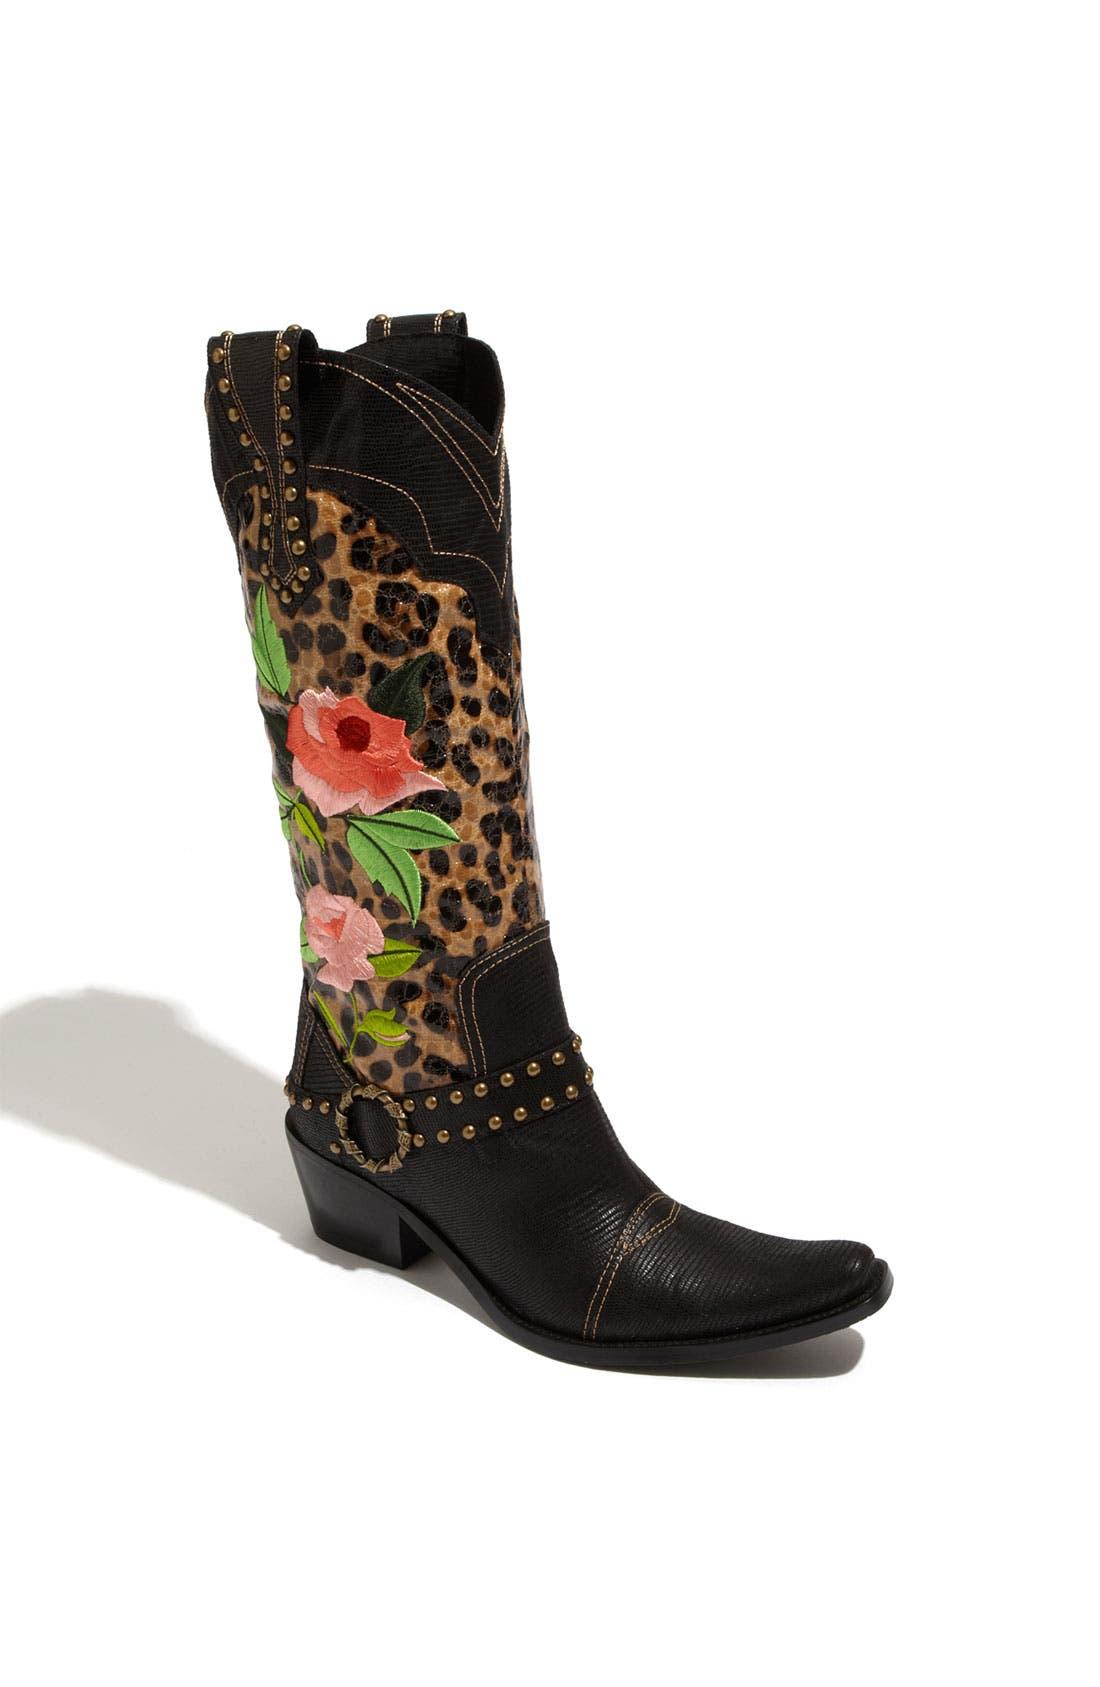 Alternate Image 1 Selected - J. Reneé 'Dakota' Boot